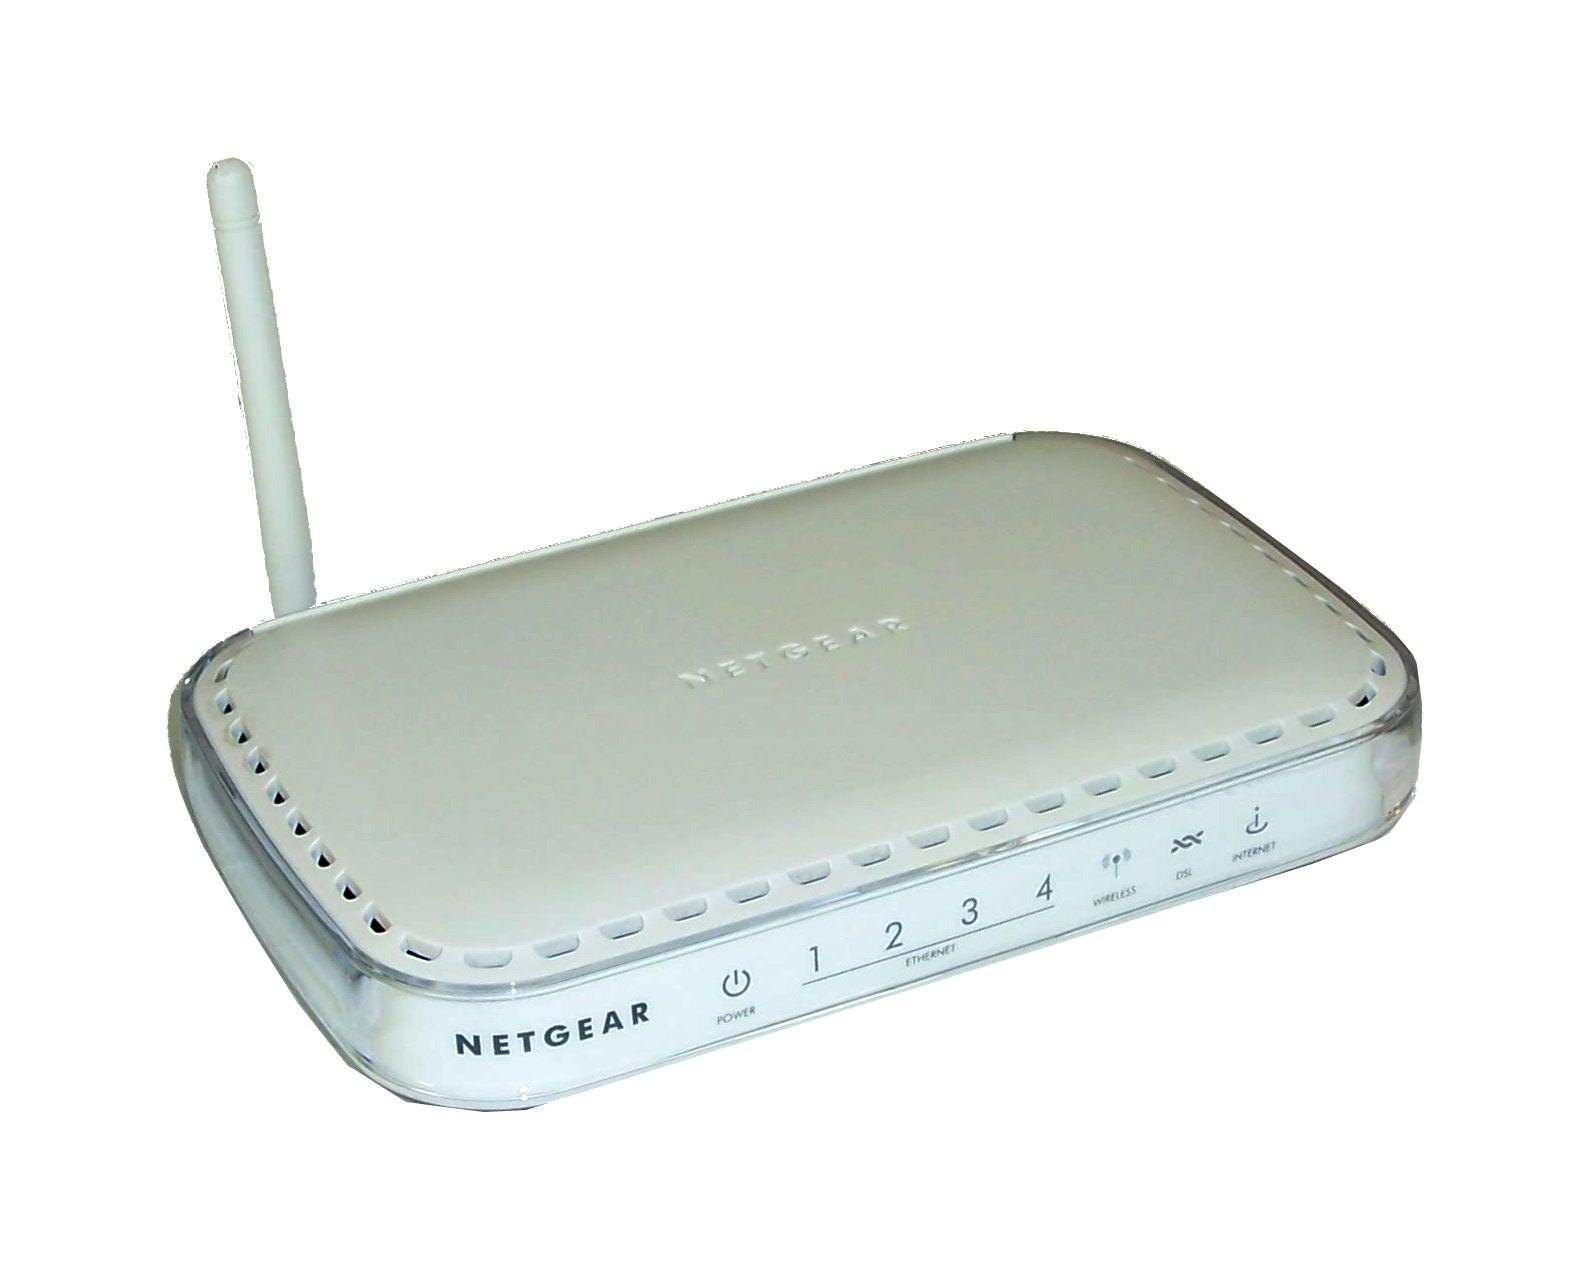 Netgear DG834G v4 4-Port 54Mbps Wireless ADSL2+ Modem ...